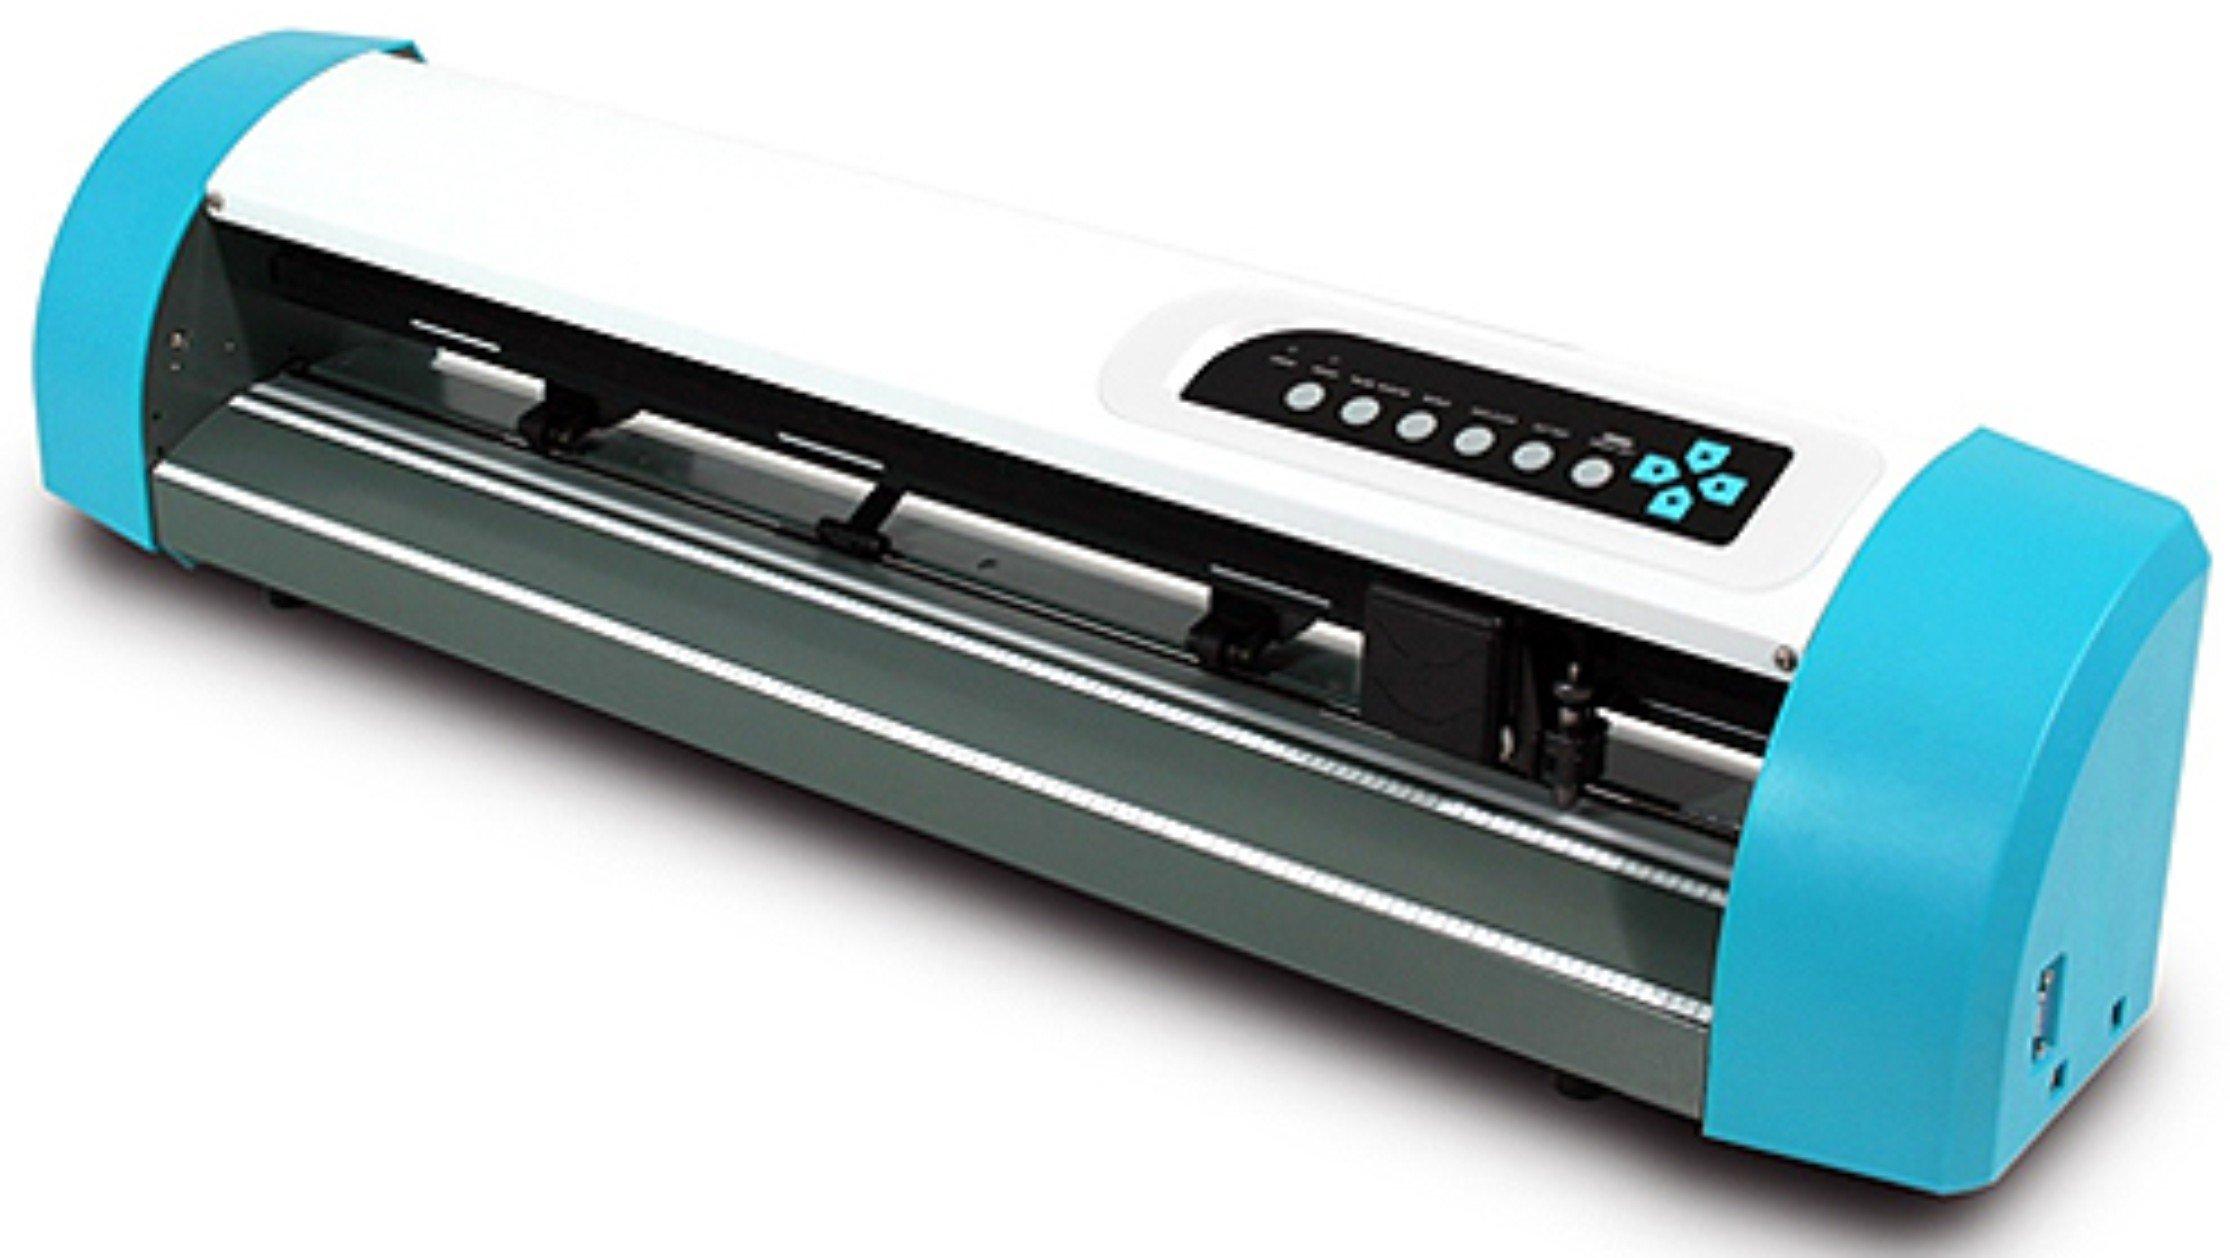 GCC AR-24 Desktop Vinyl Cutter by GCC